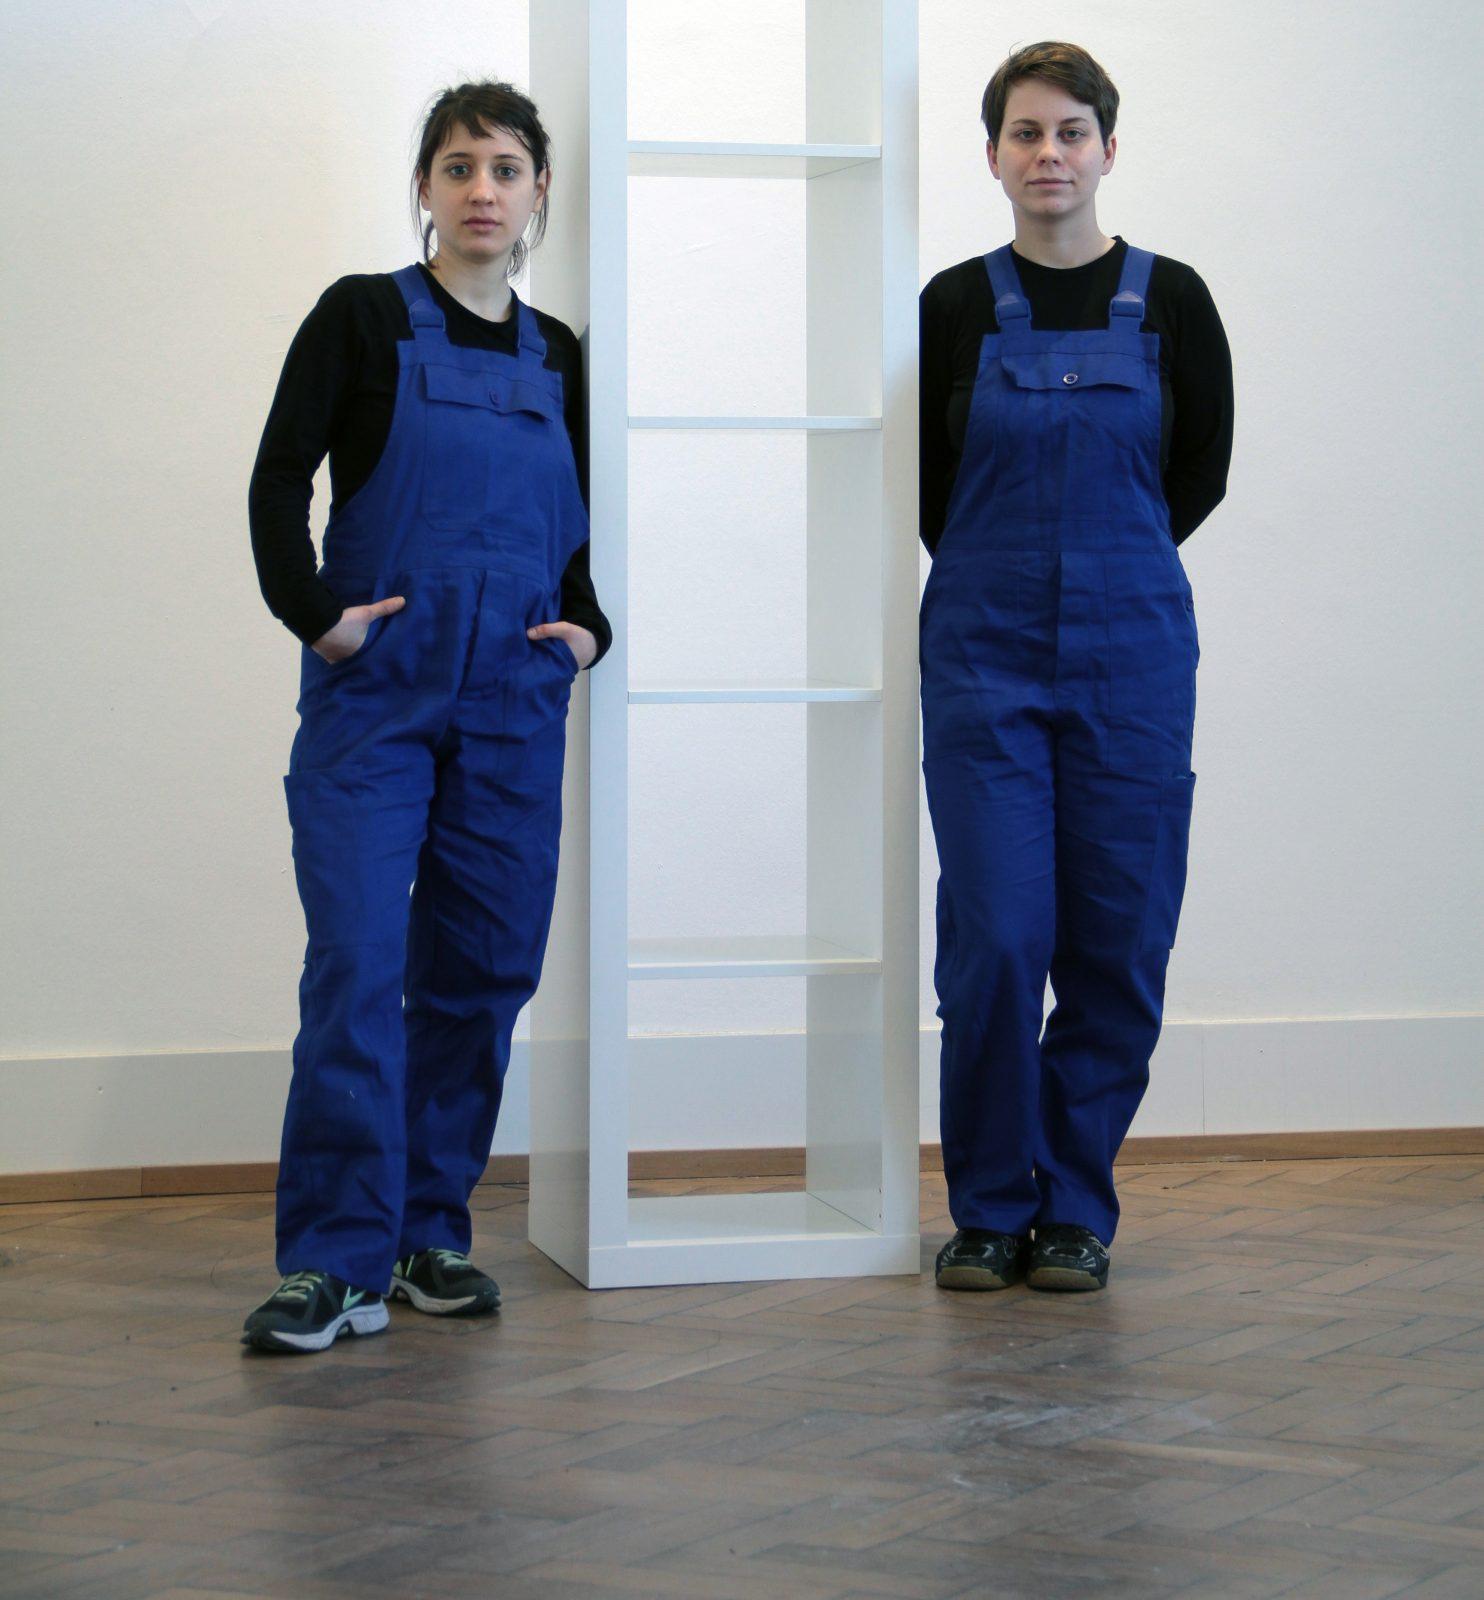 NÖ Waldviertel Galerie Kunst - Sööt / Zeyringer